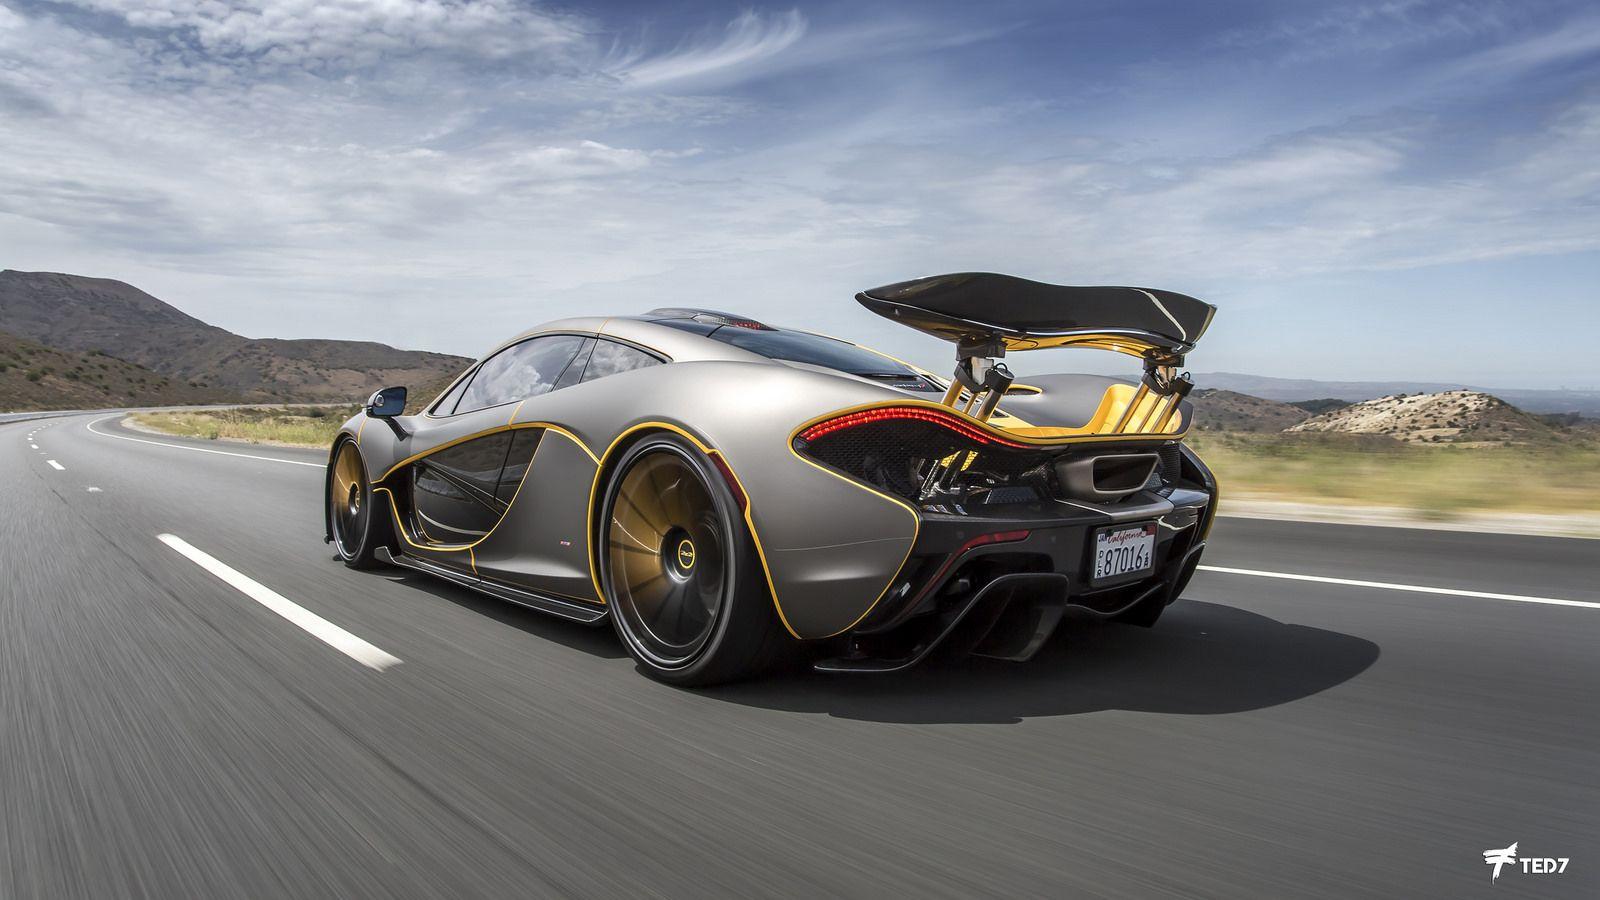 Fast Machine Mclaren P1 Mclaren P1 Mclaren Super Cars